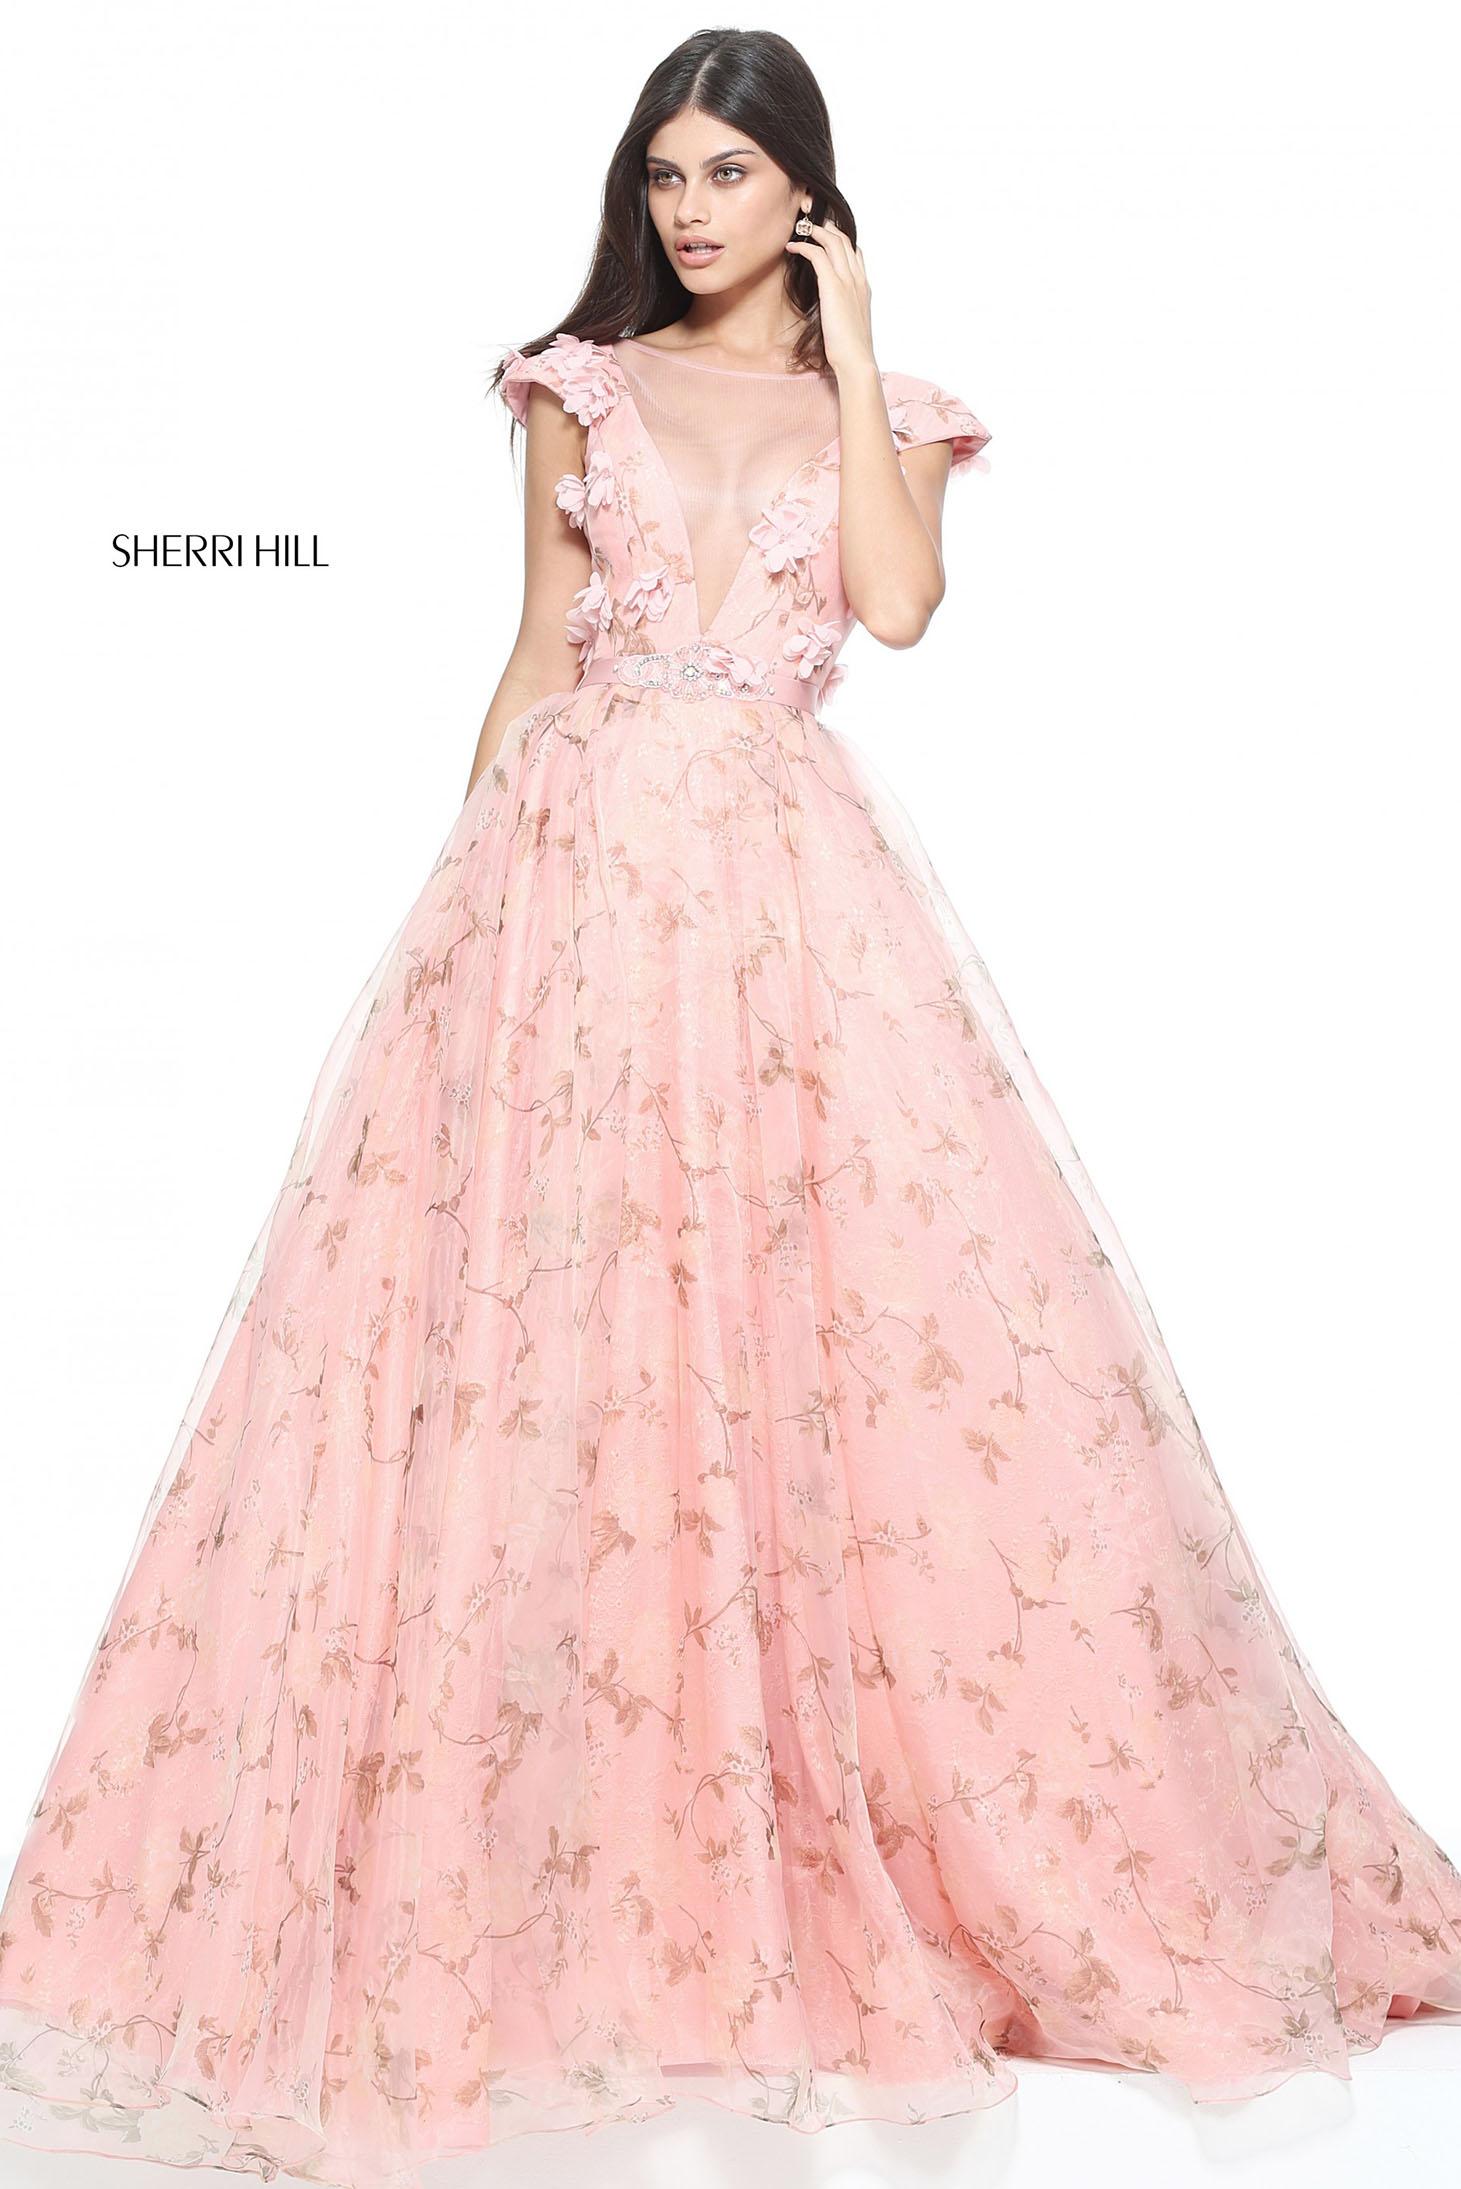 Sherri Hill 51104 LightPink Dress